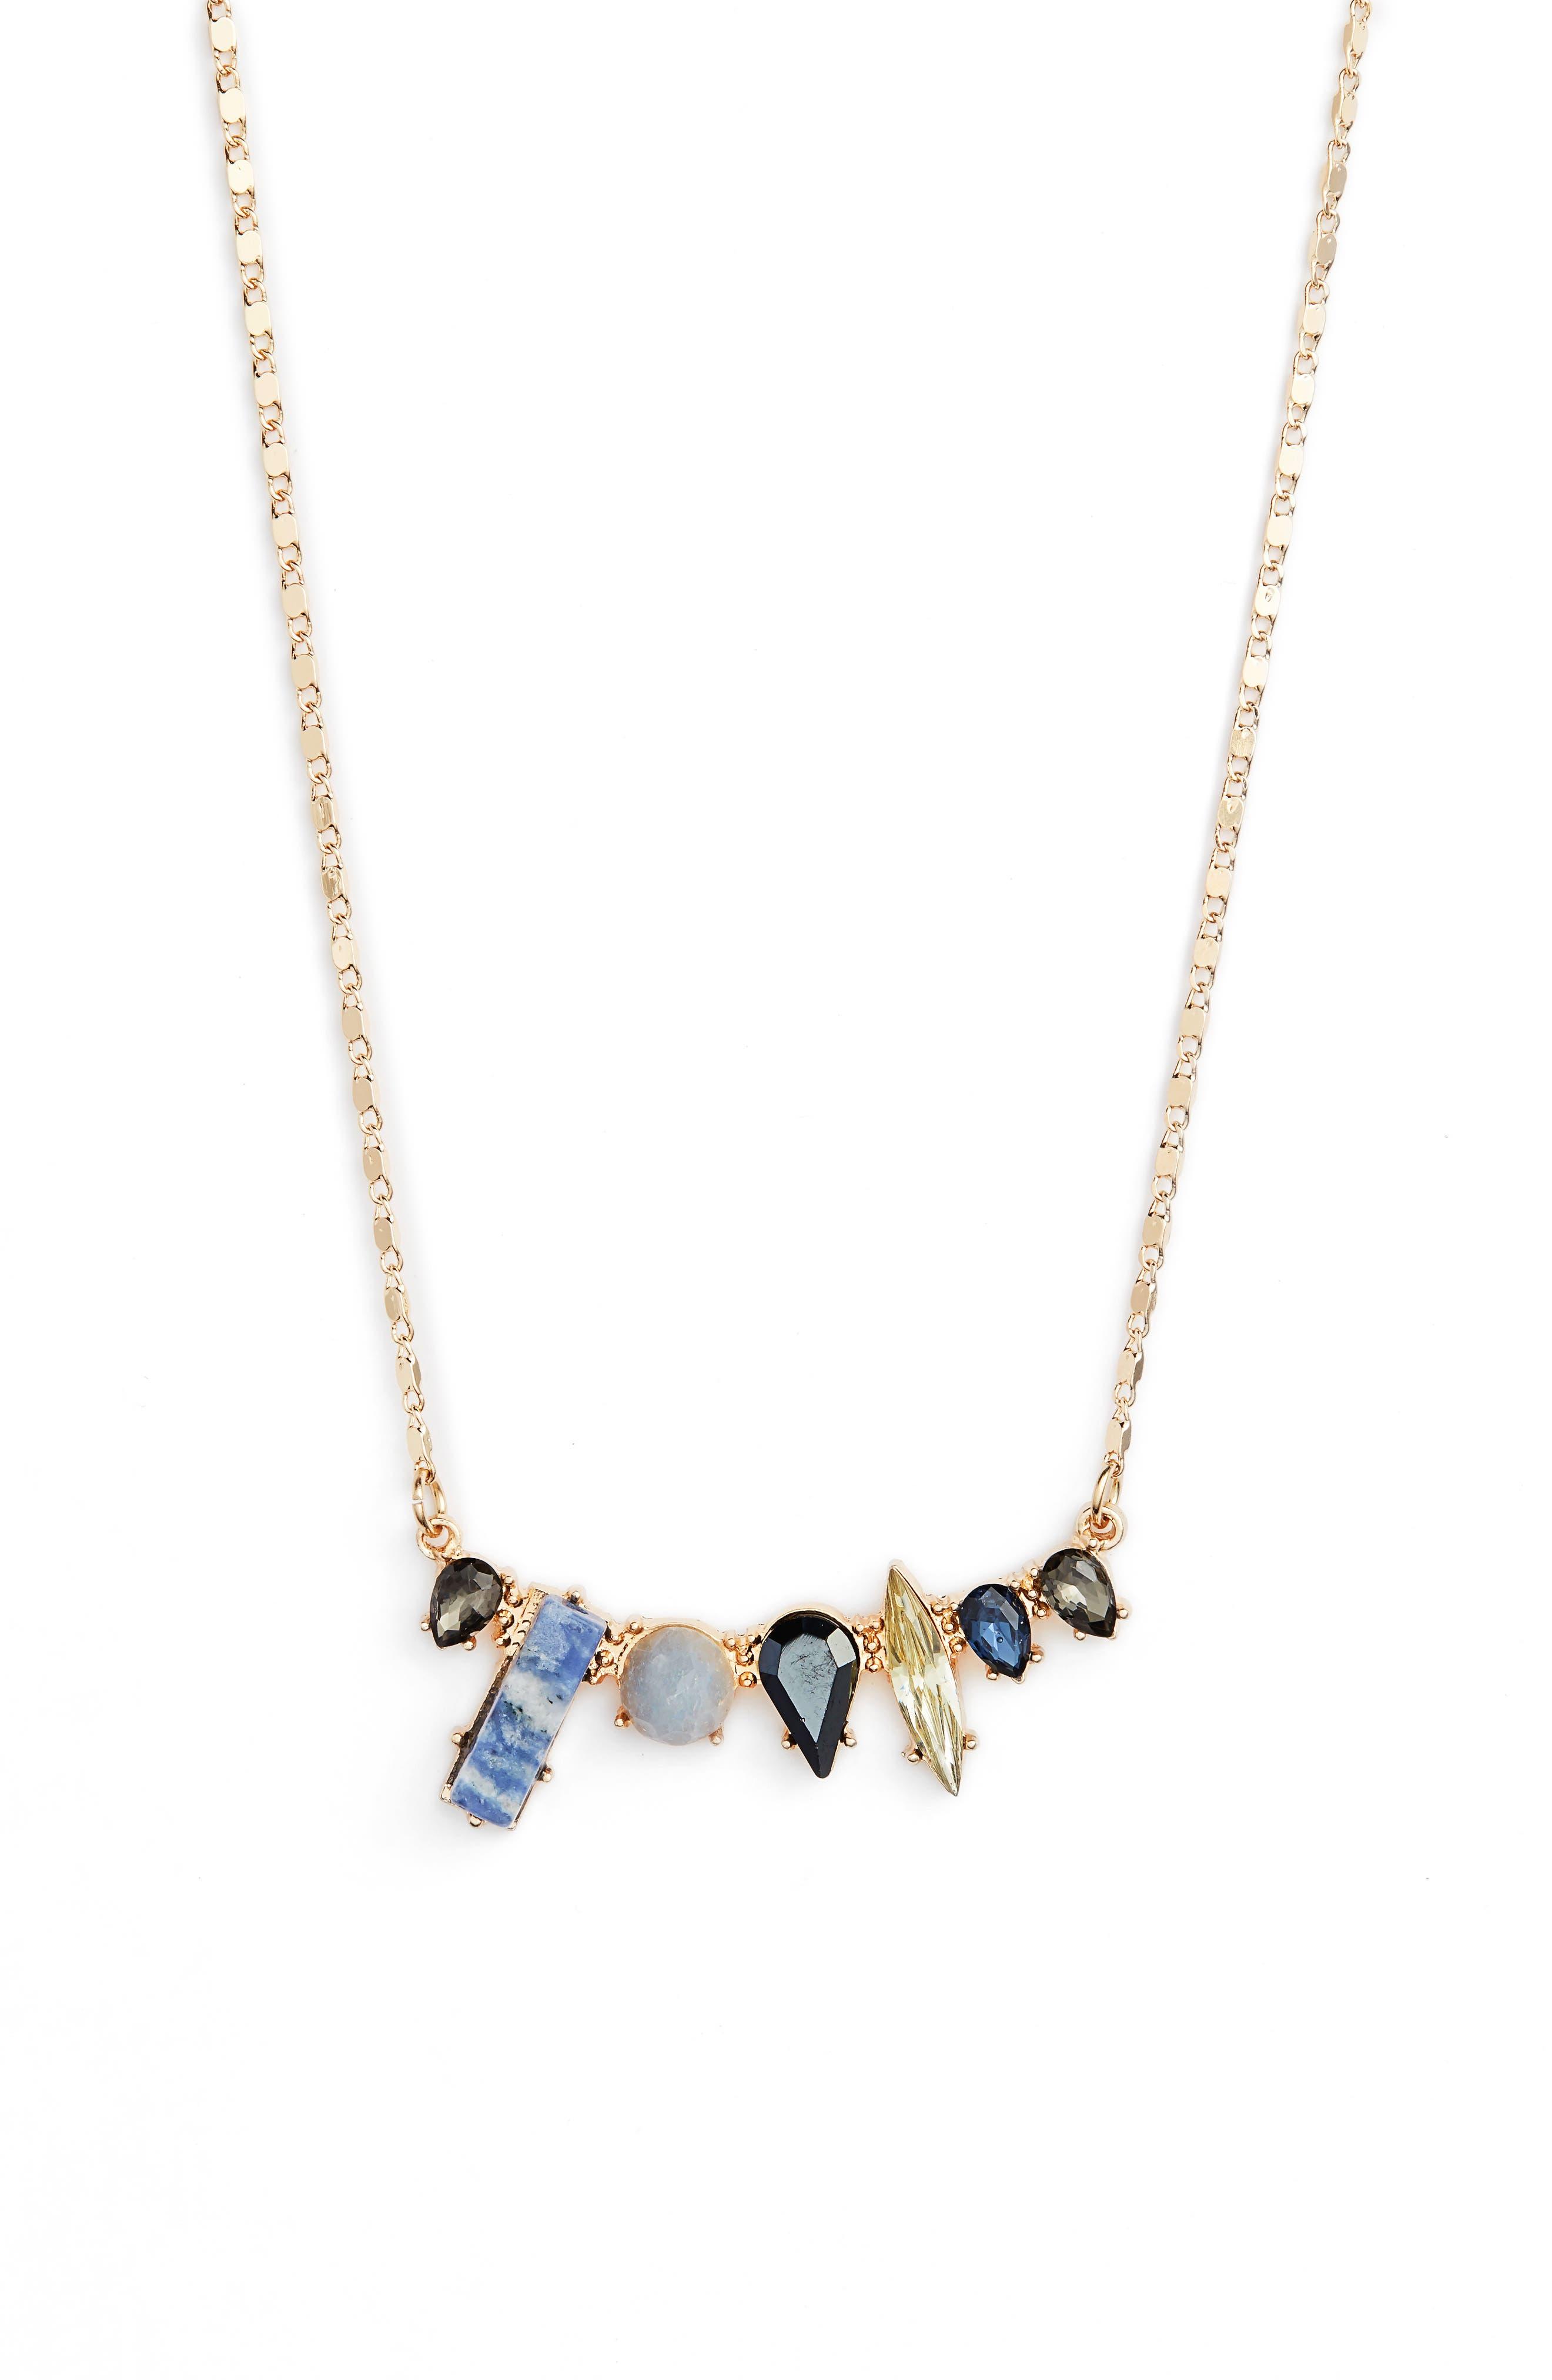 Lapis & Crystal Mini Statement Necklace,                             Main thumbnail 1, color,                             Gold/ Blue/ Black